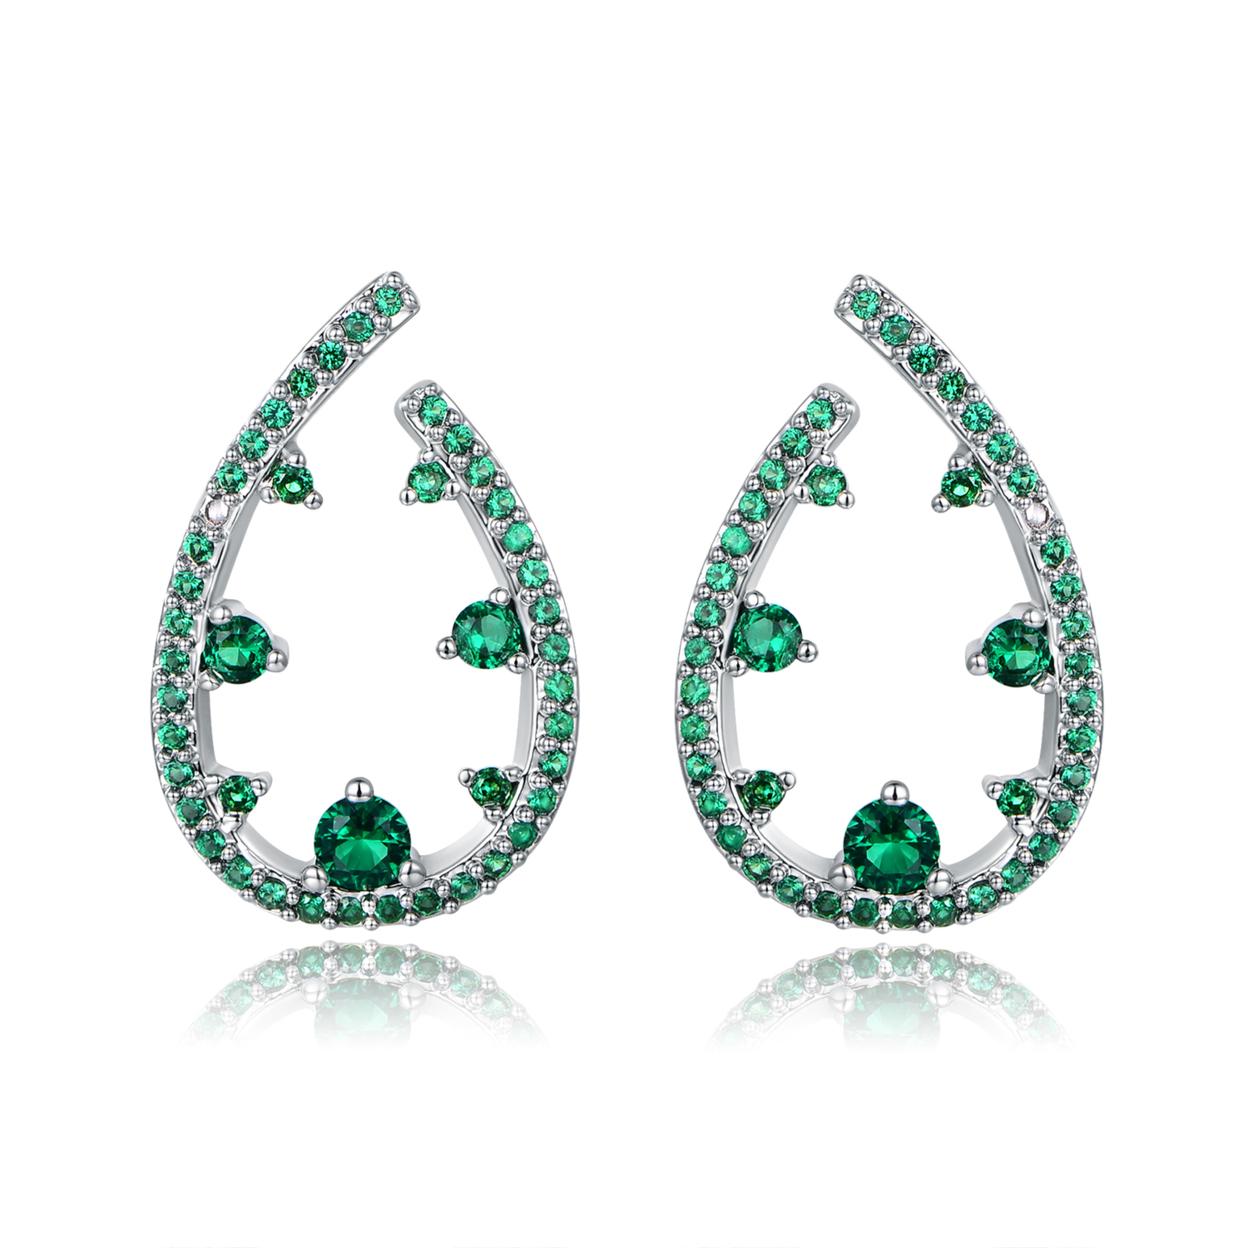 18k White Gold Plated Nano Emerald Teardrop Earrings Er5198-09